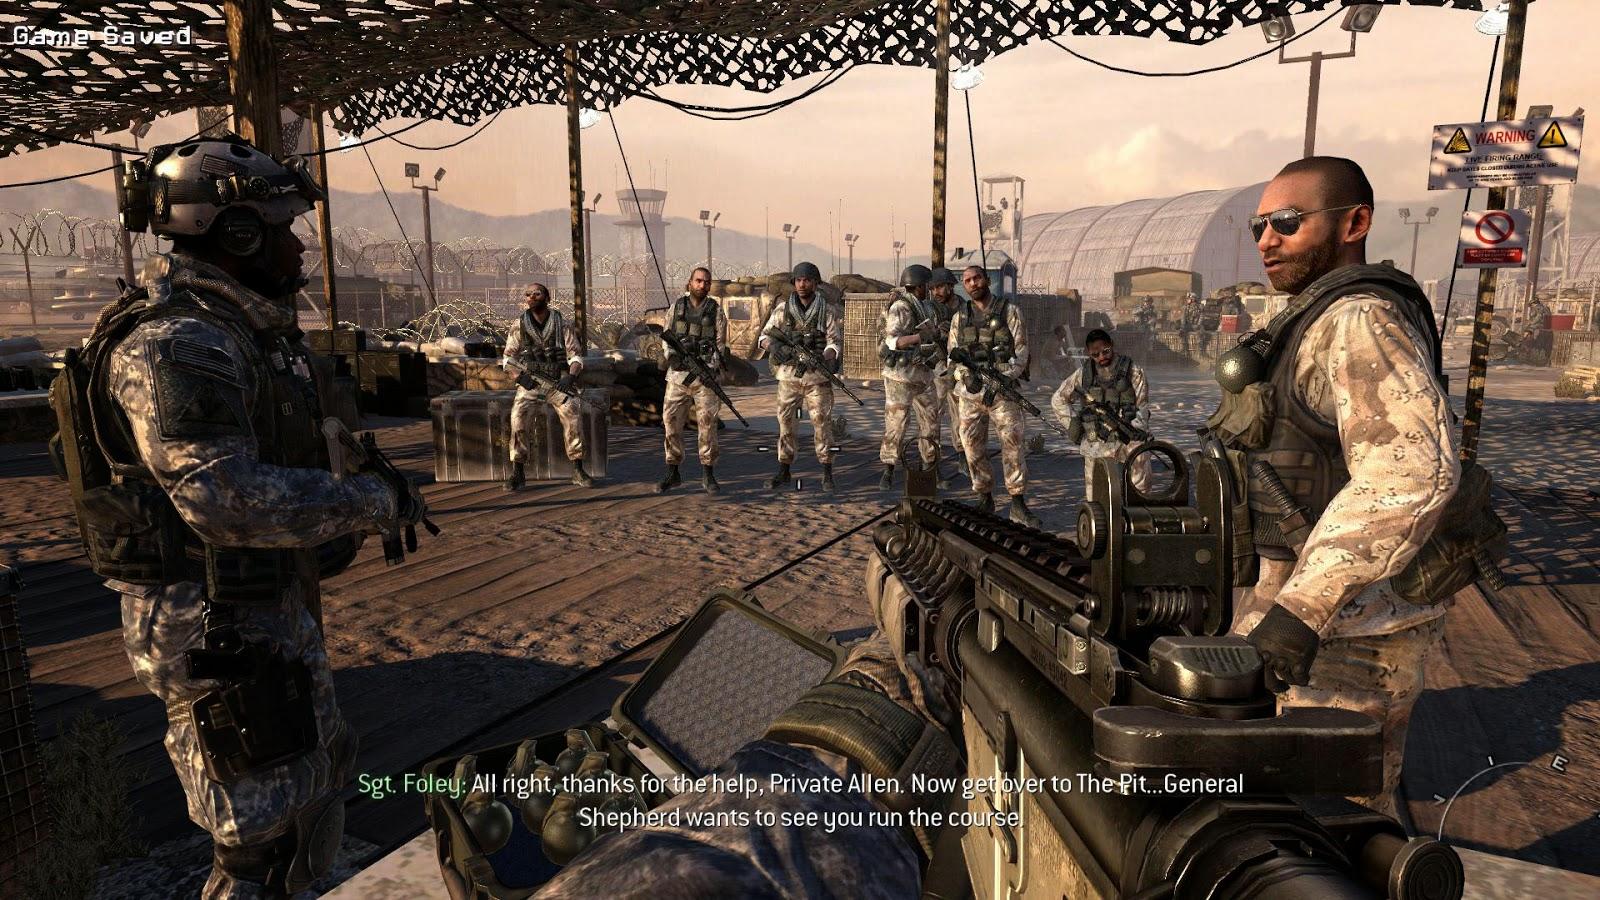 call of duty modern warfare 2 download pc completo gratis